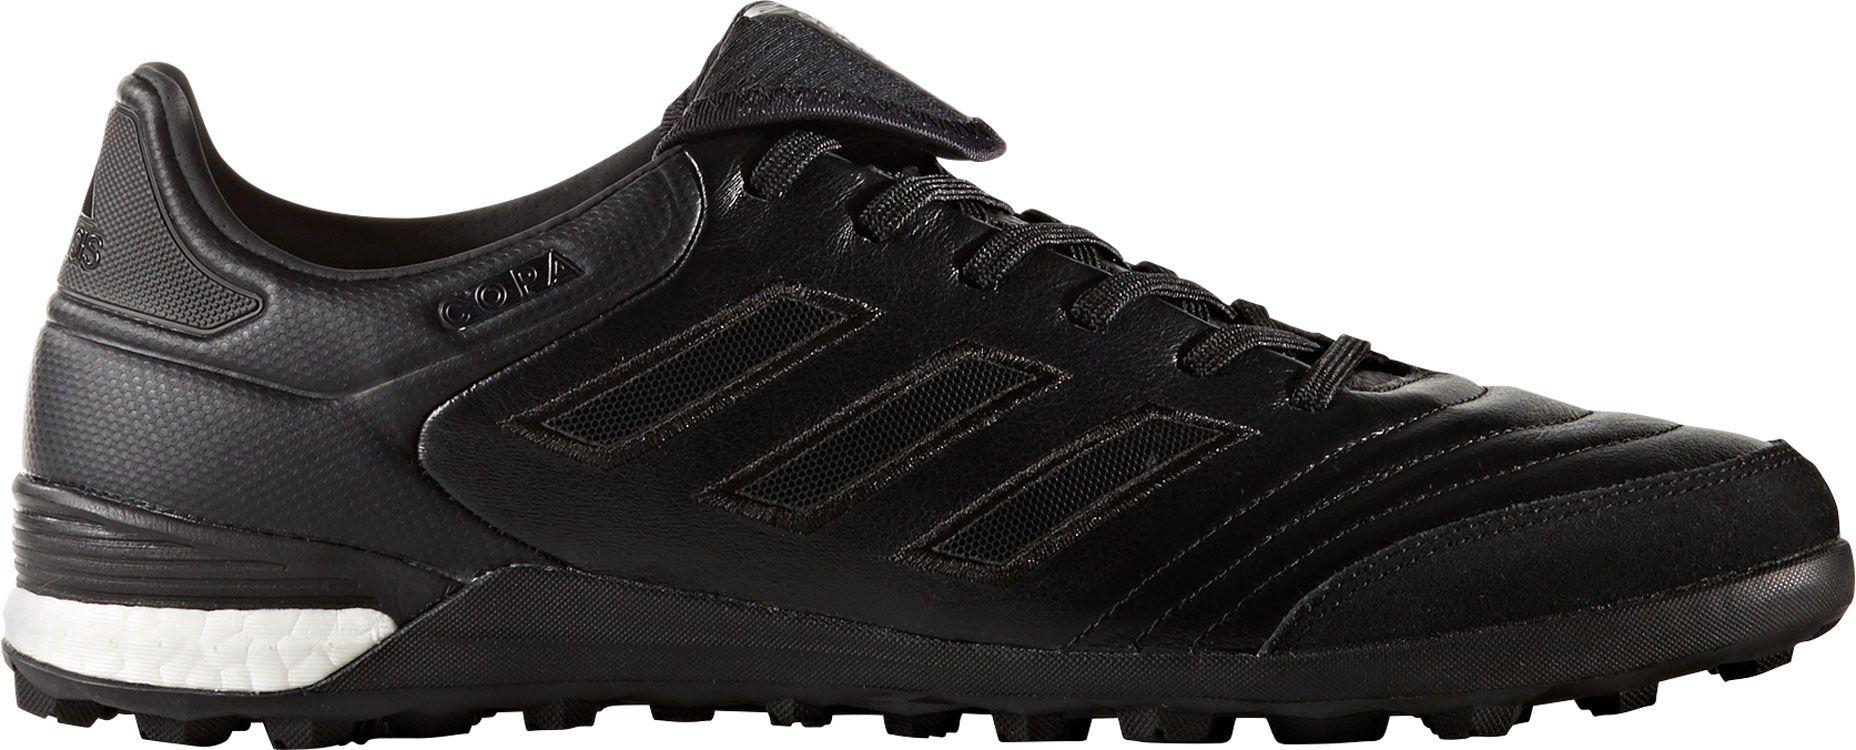 b26872591d3 ... White Soccer Black Red top  adidas copa tango 17.1 astro turf mens  football trainers black noimagefound performance sportswear ba11b c9832 ...